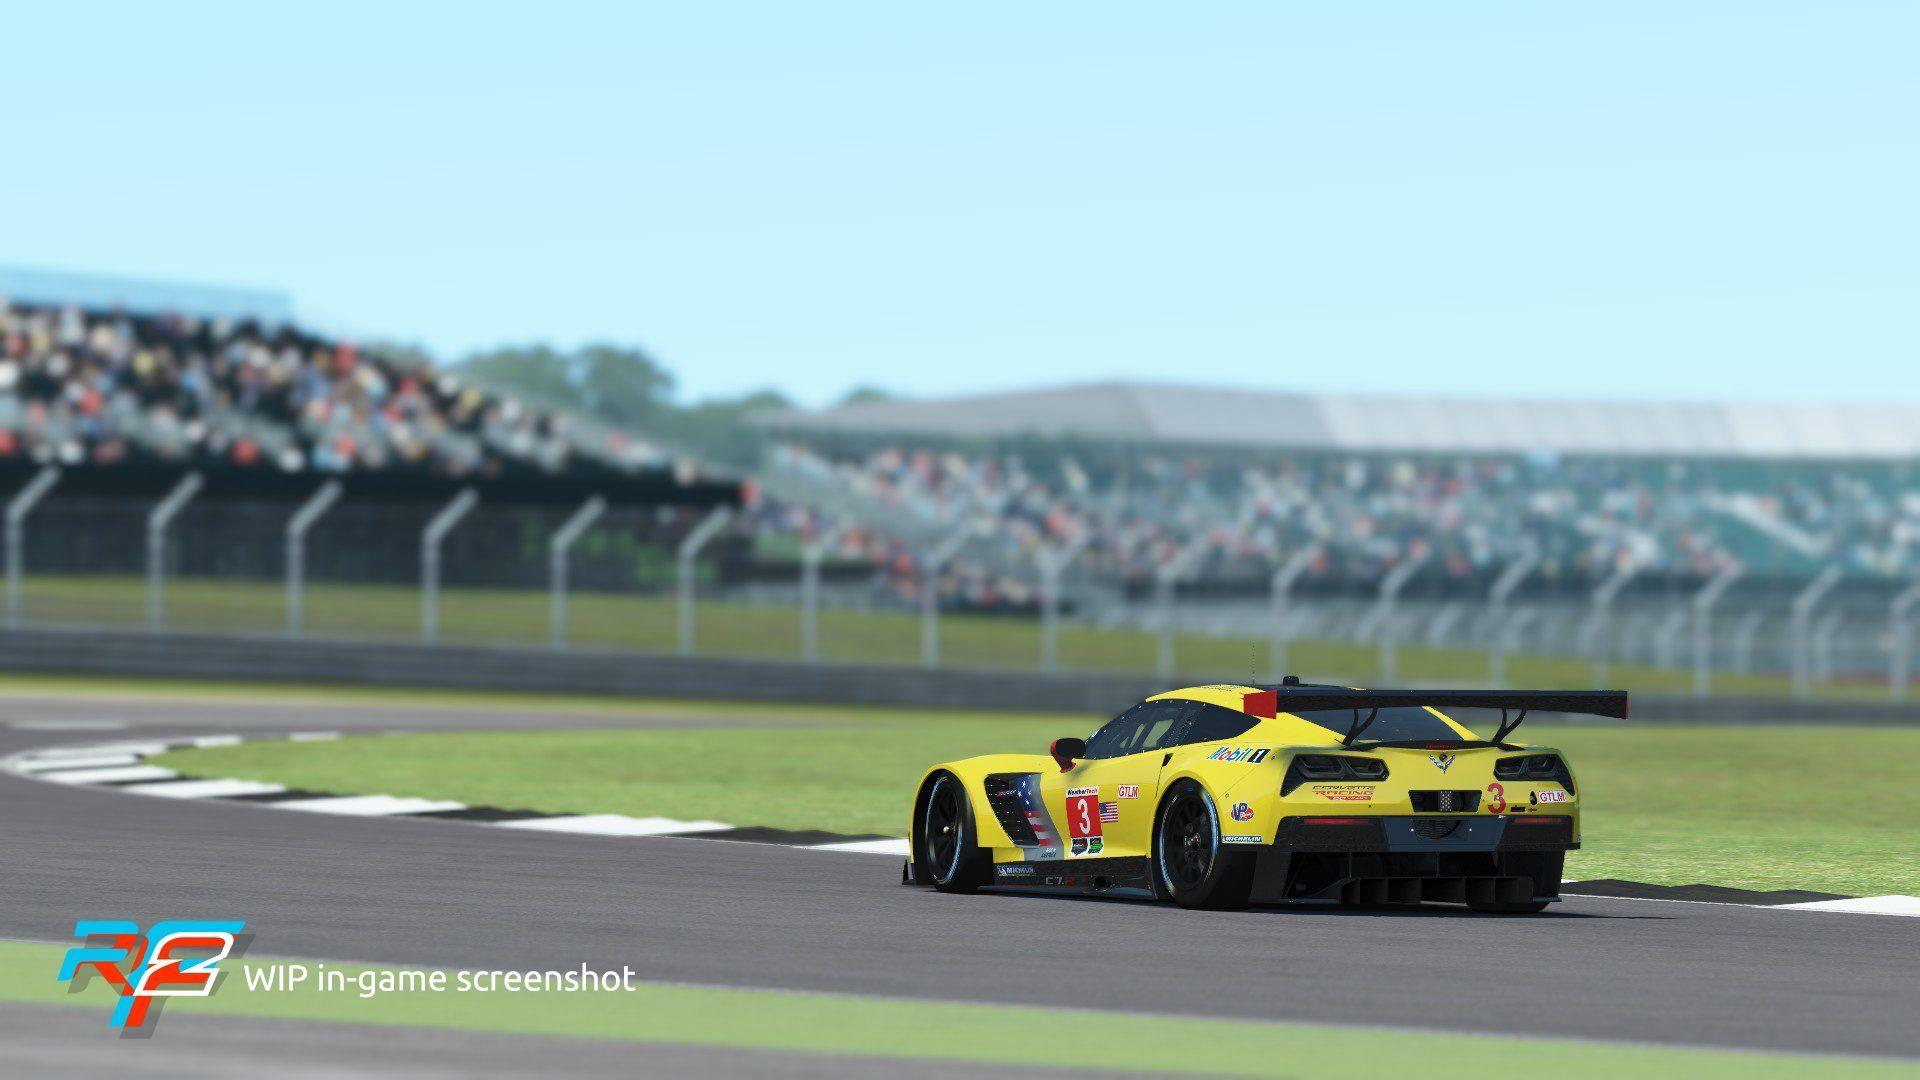 Laser-Scanned Sebring International Raceway Coming to rFactor2